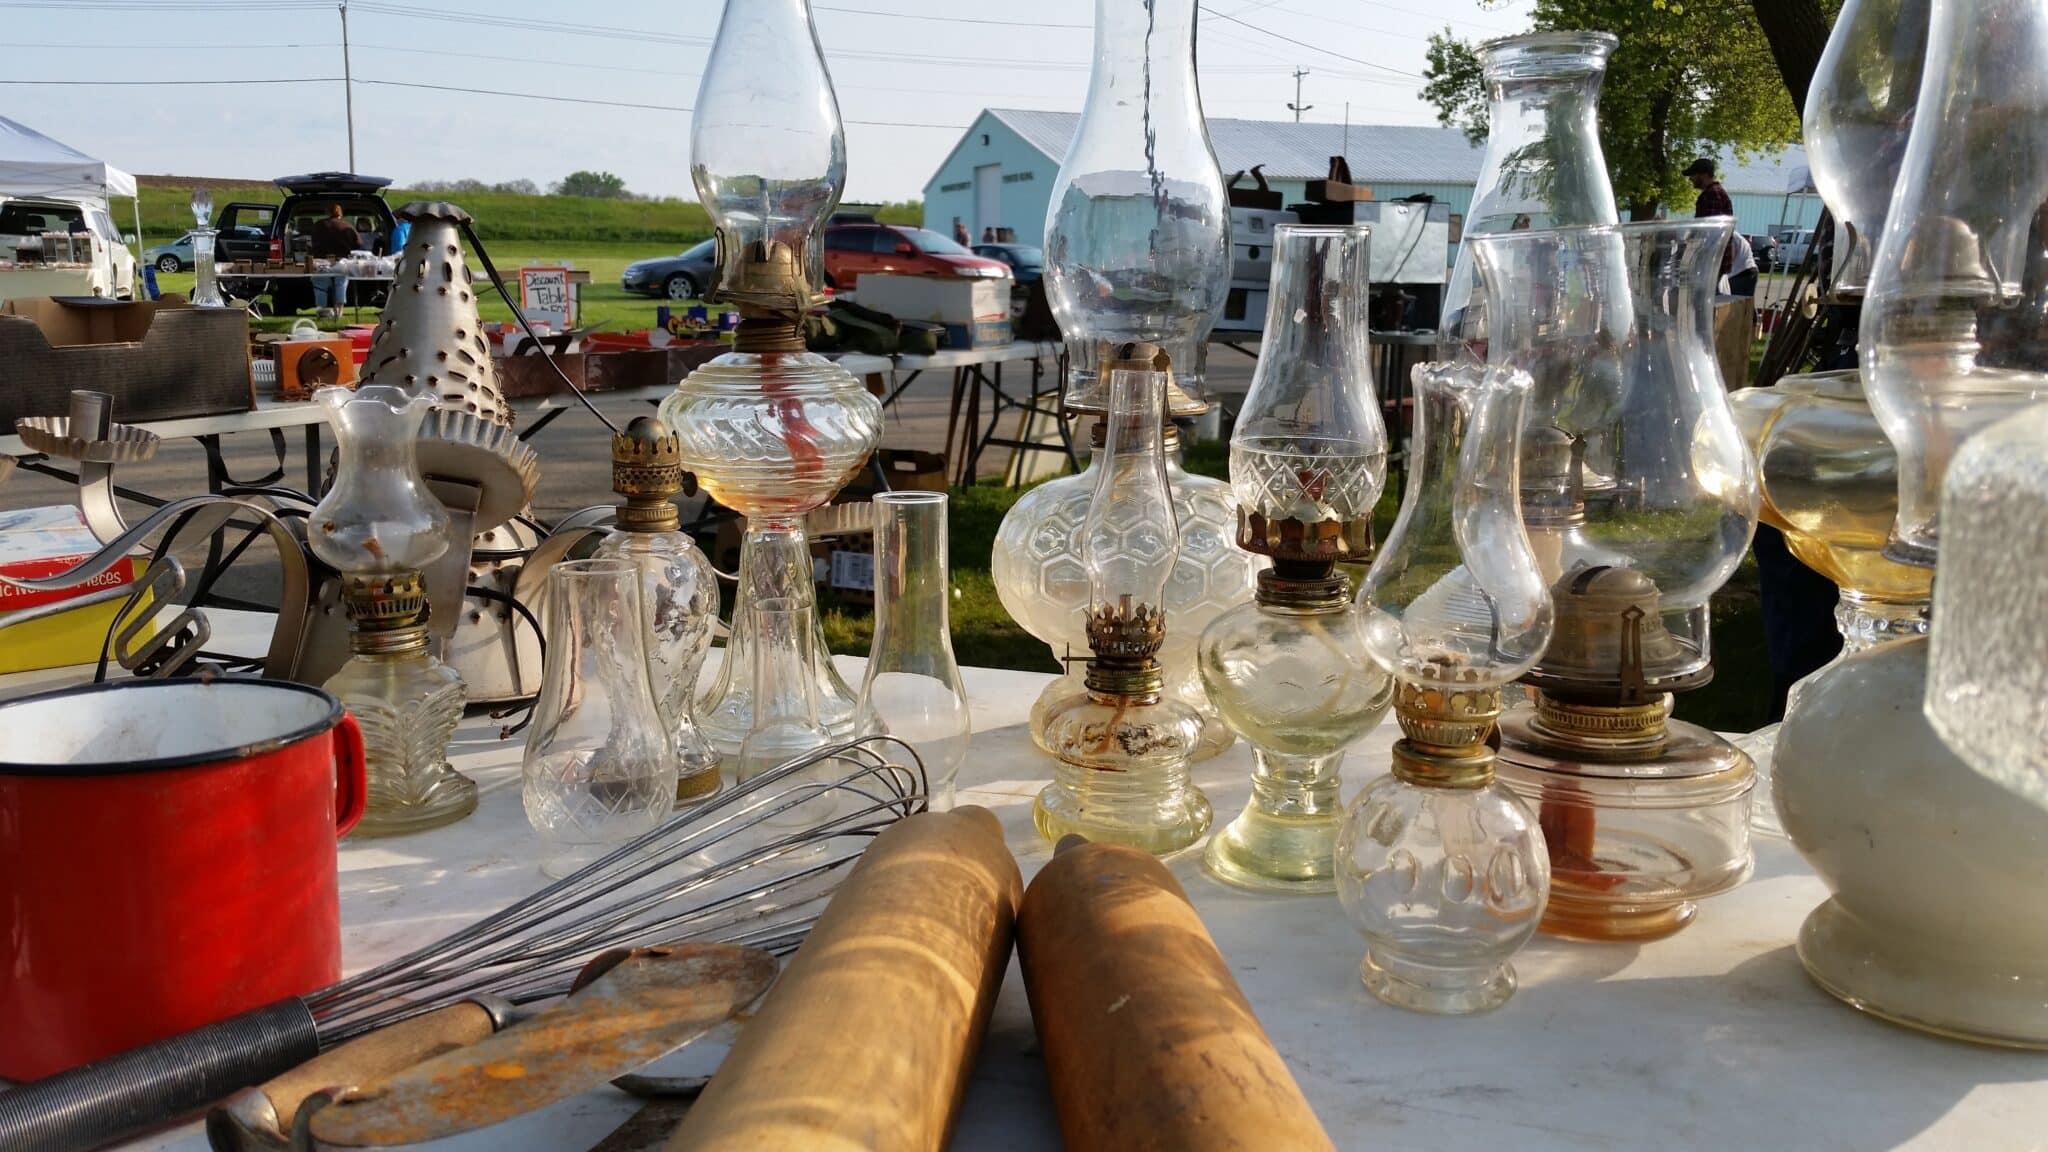 Flea Market Photos May 21 | Dodge County Fairgrounds